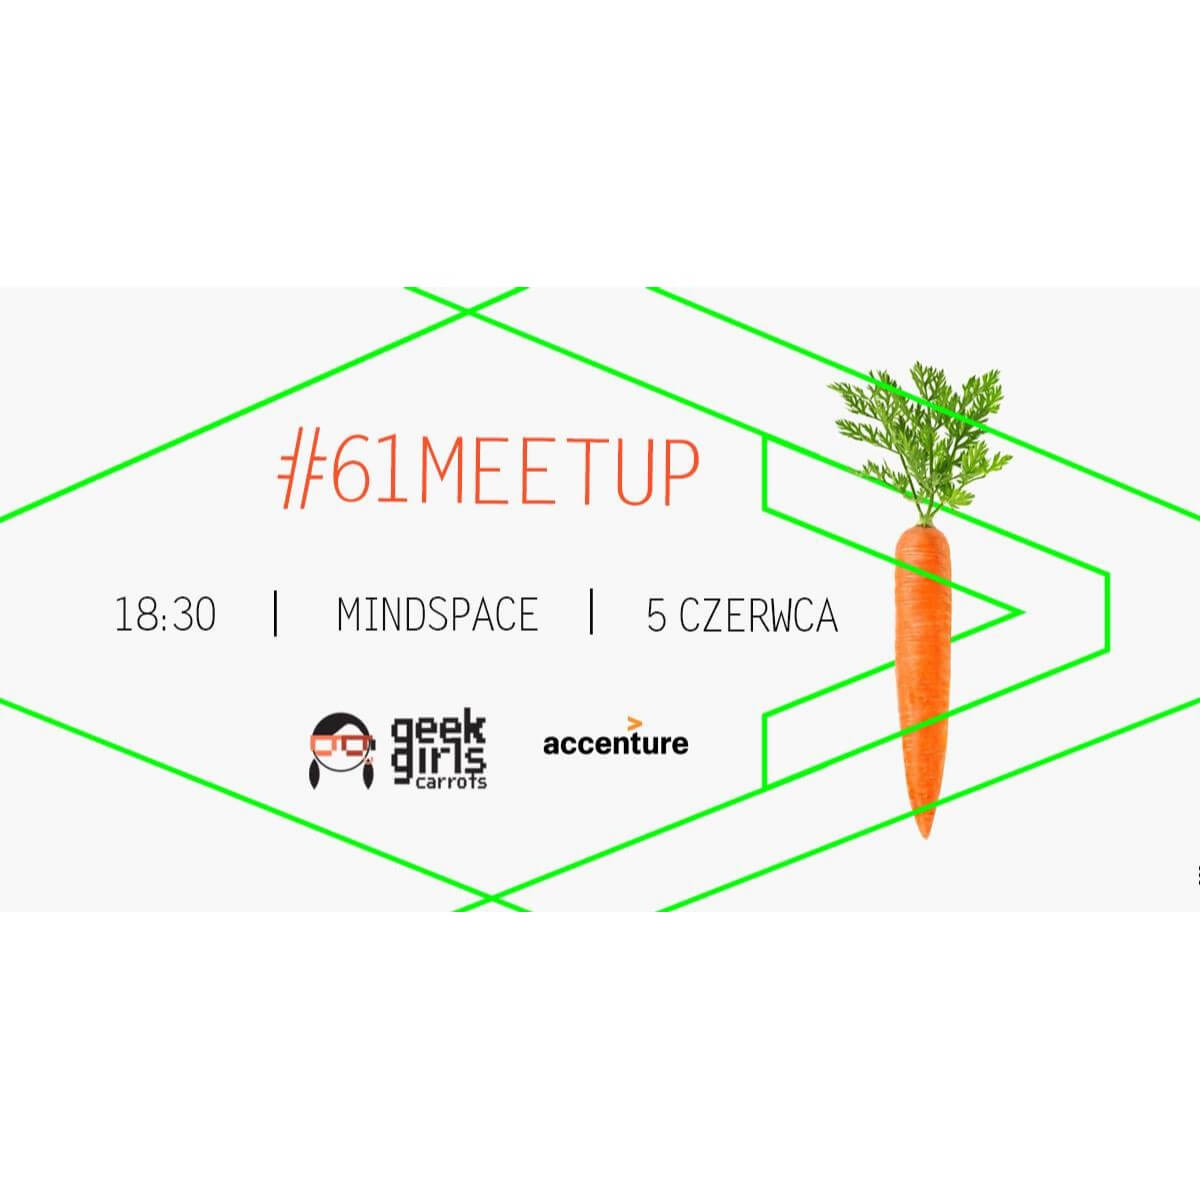 Geek Girls Carrots Warsaw #61